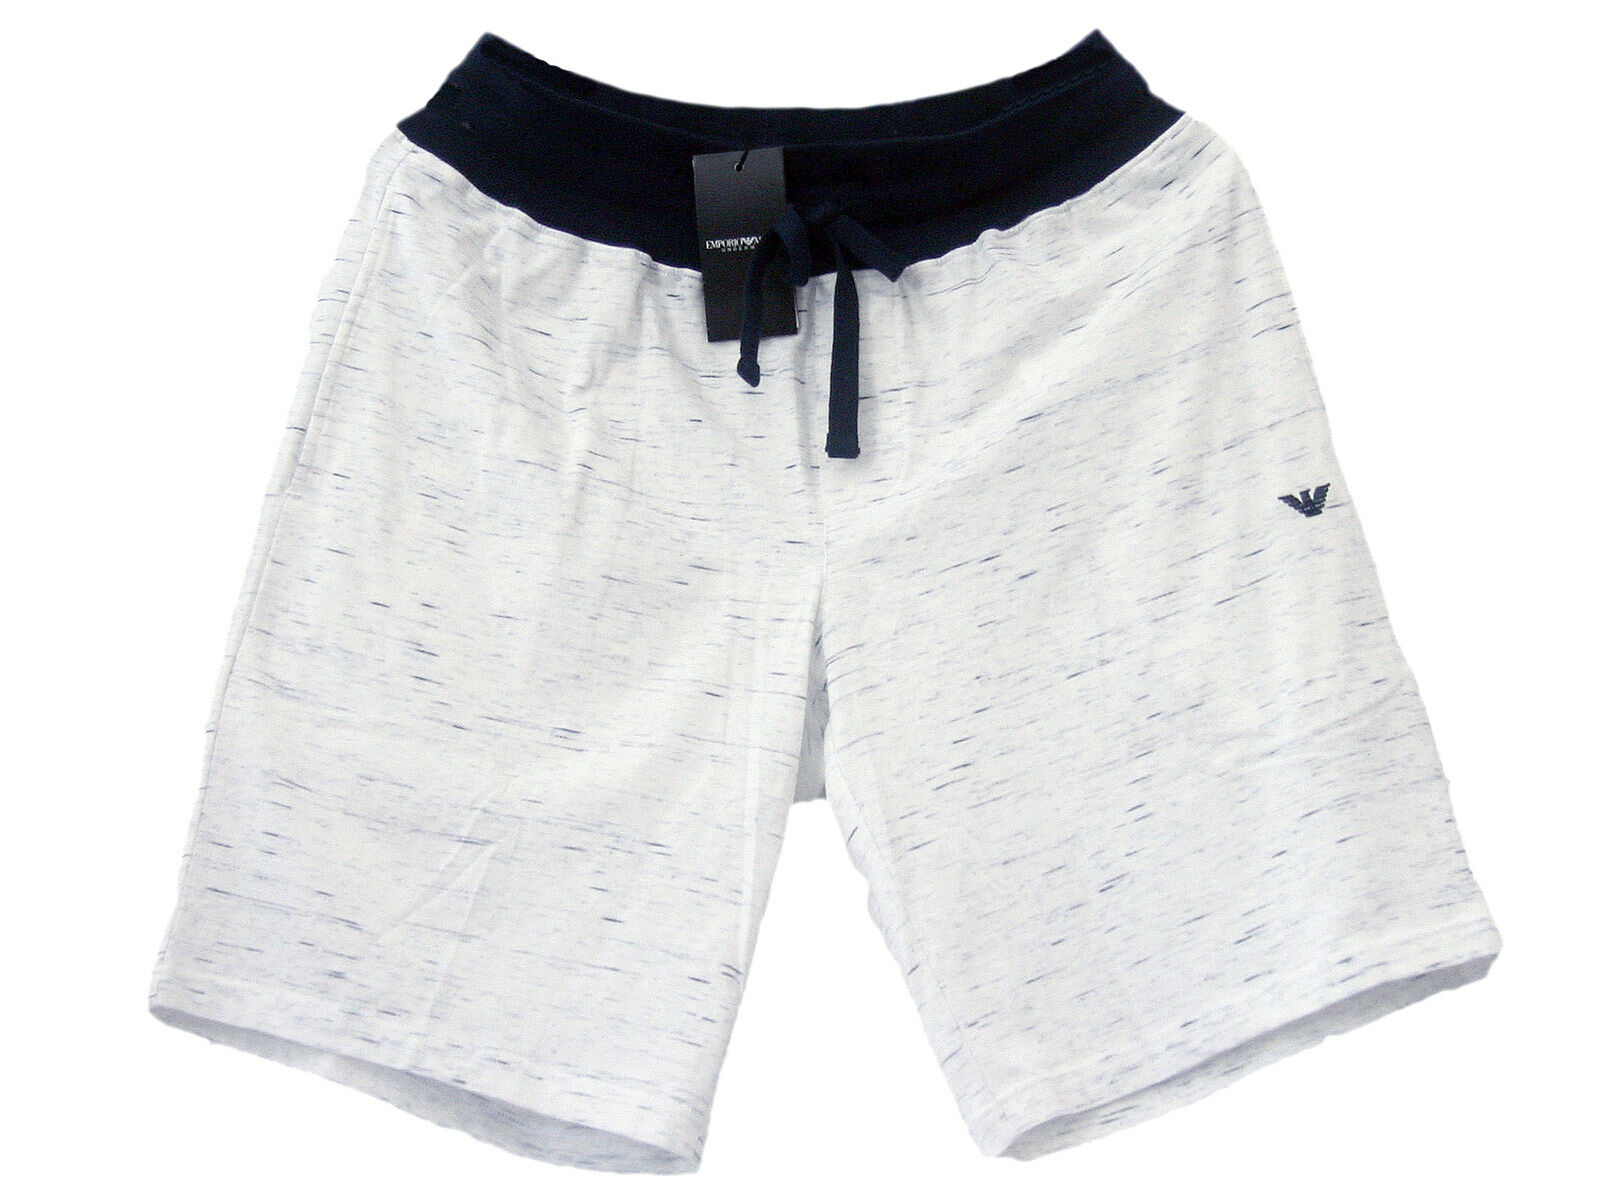 Emporio Armani halblange Freizeit-Hose Pyjama Hose Bermuda Shorts Baumwolle